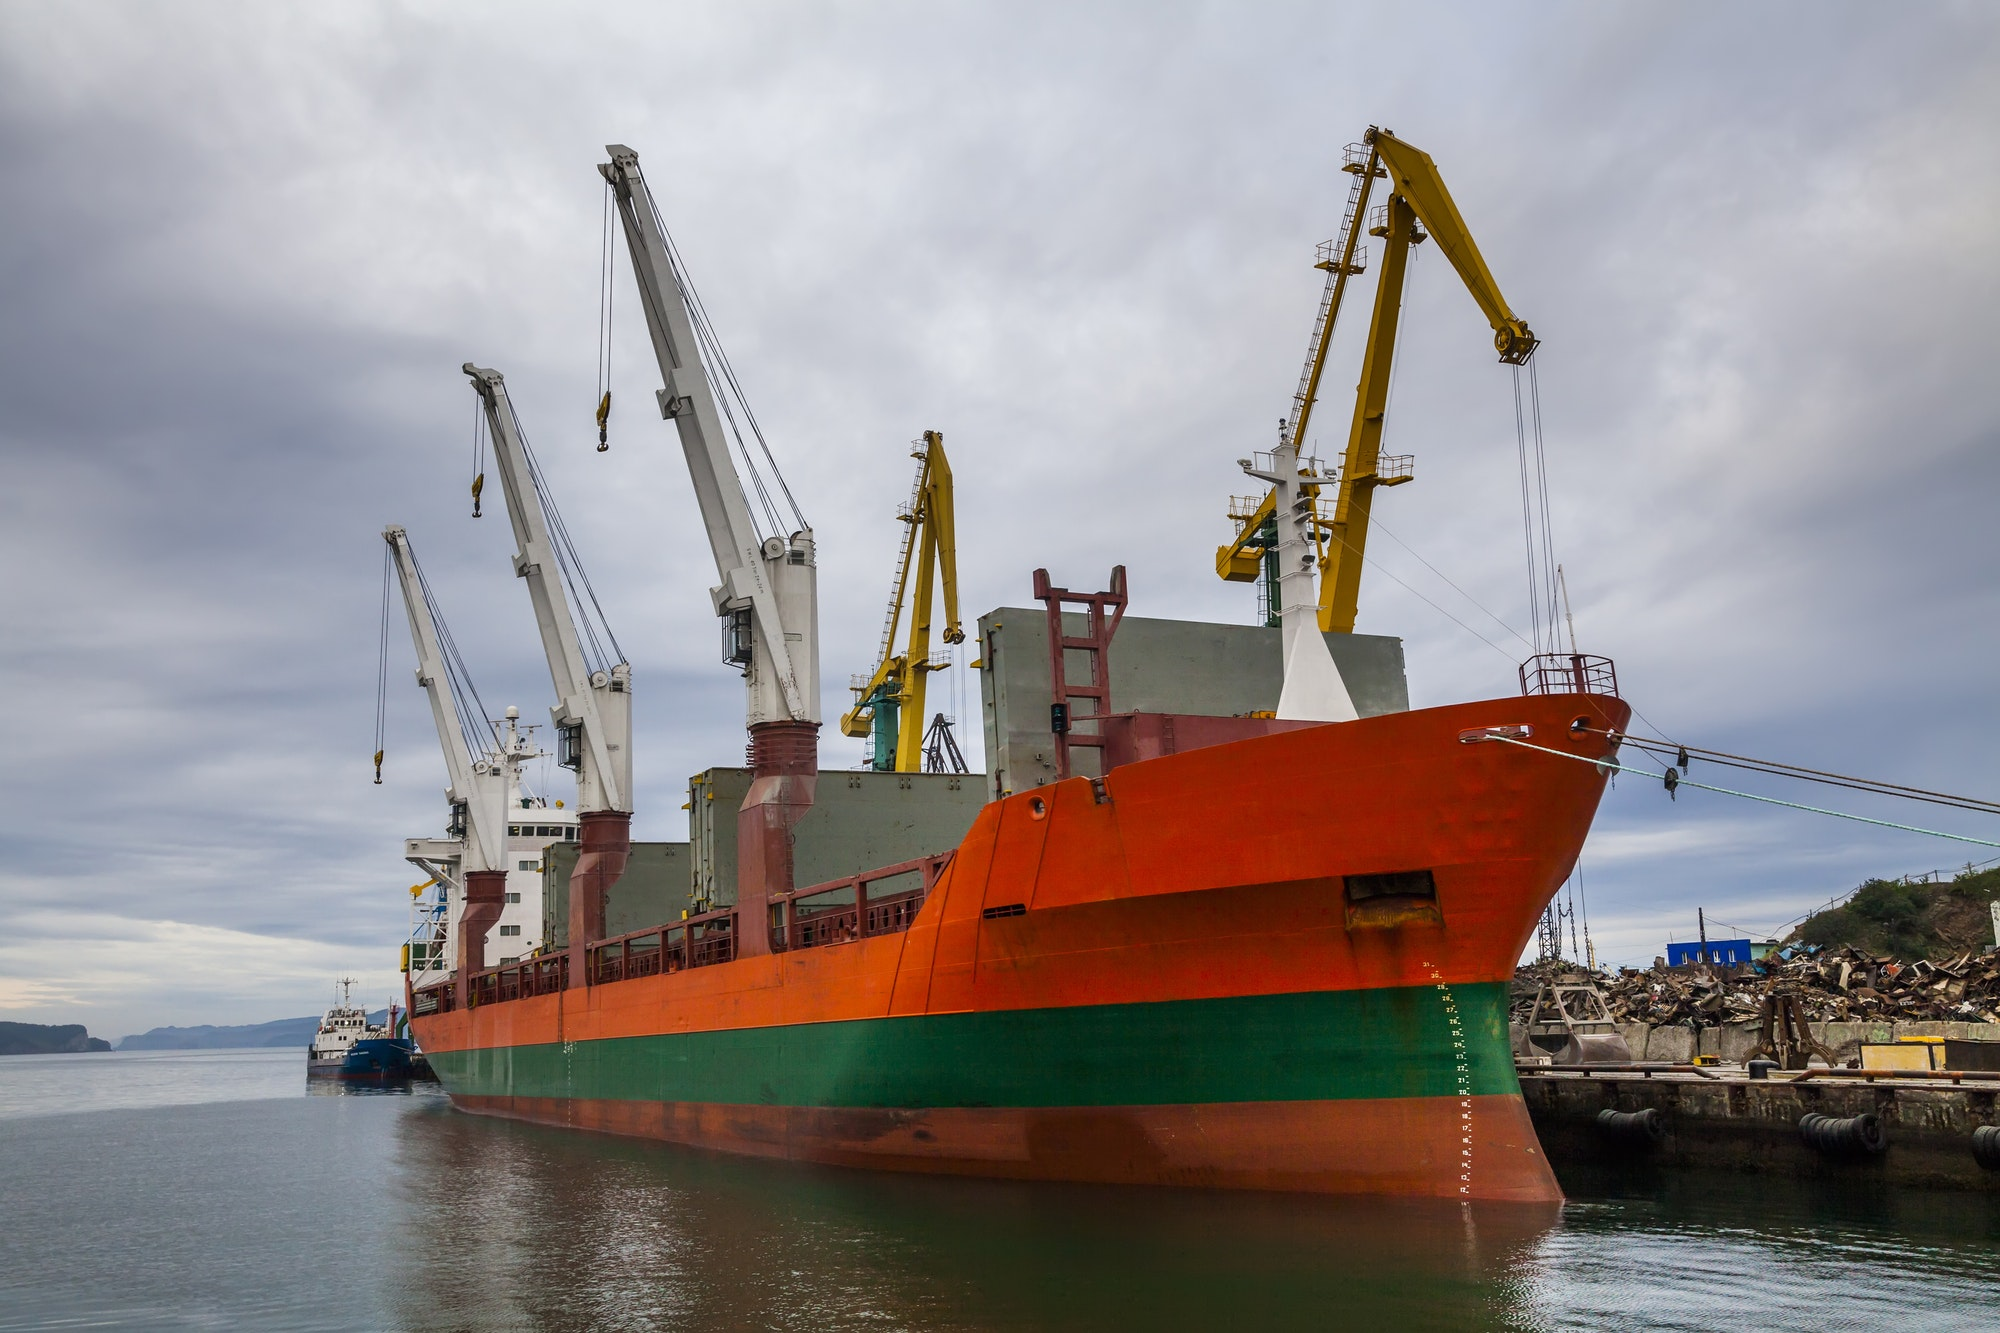 Cargo ship in the port. Kamchatka Peninsula.